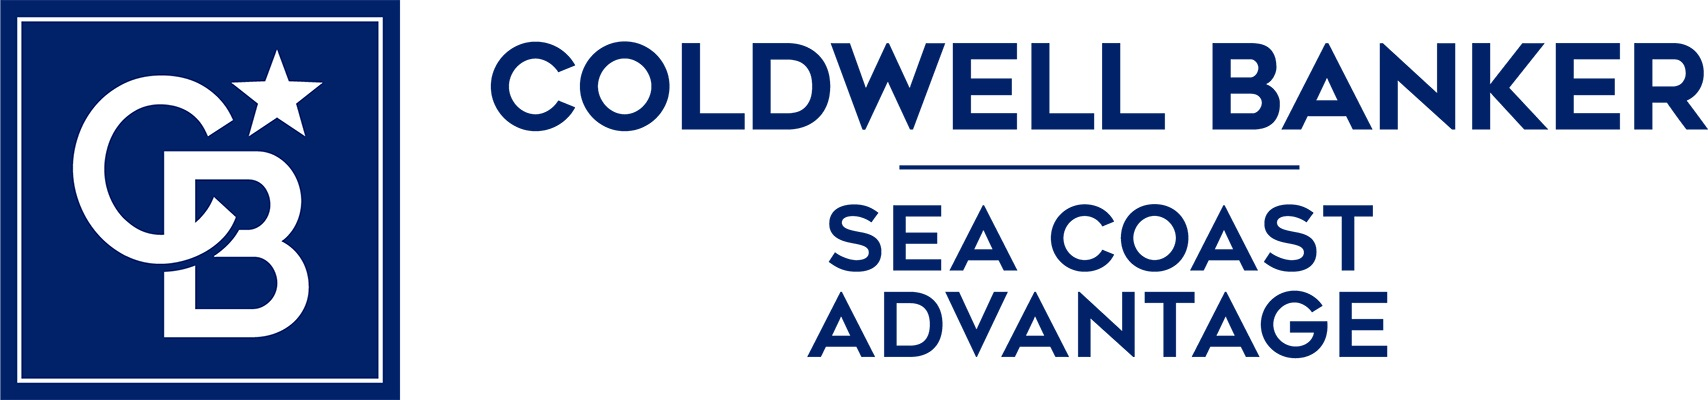 Heather O'Sullivan - Coldwell Banker Sea Coast Advantage Realty Logo